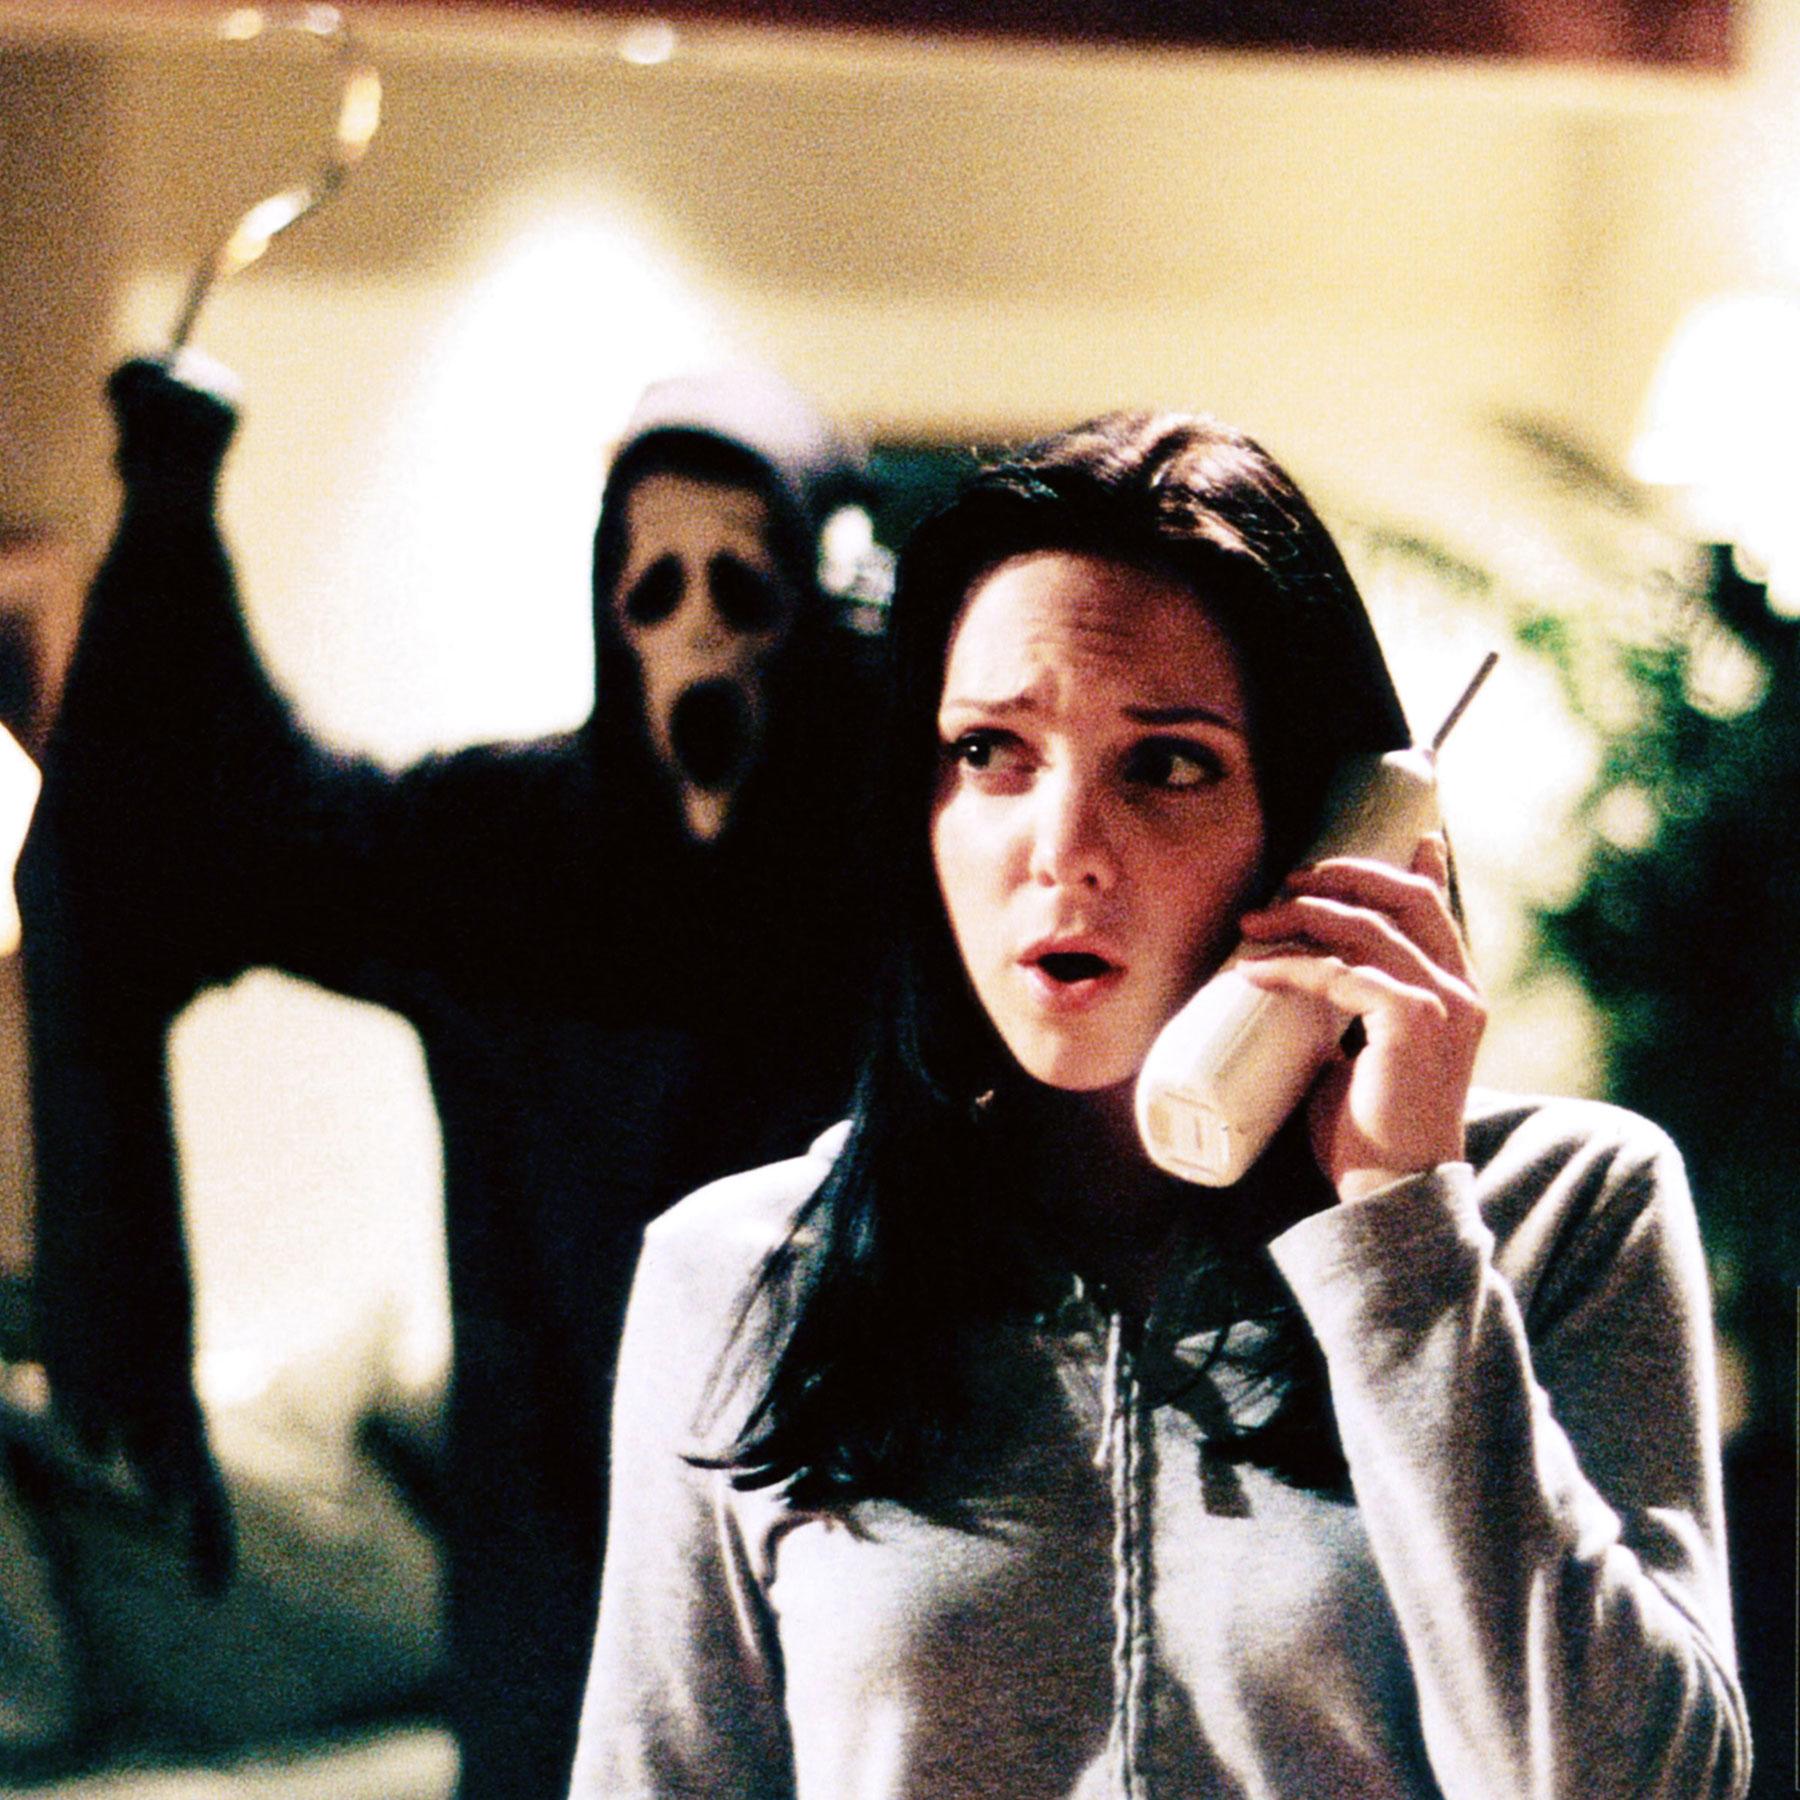 SCARY MOVIE, Dave Sheridan (rear), Anna Faris (front), 2000, © Dimension Films/courtesy Everett Coll